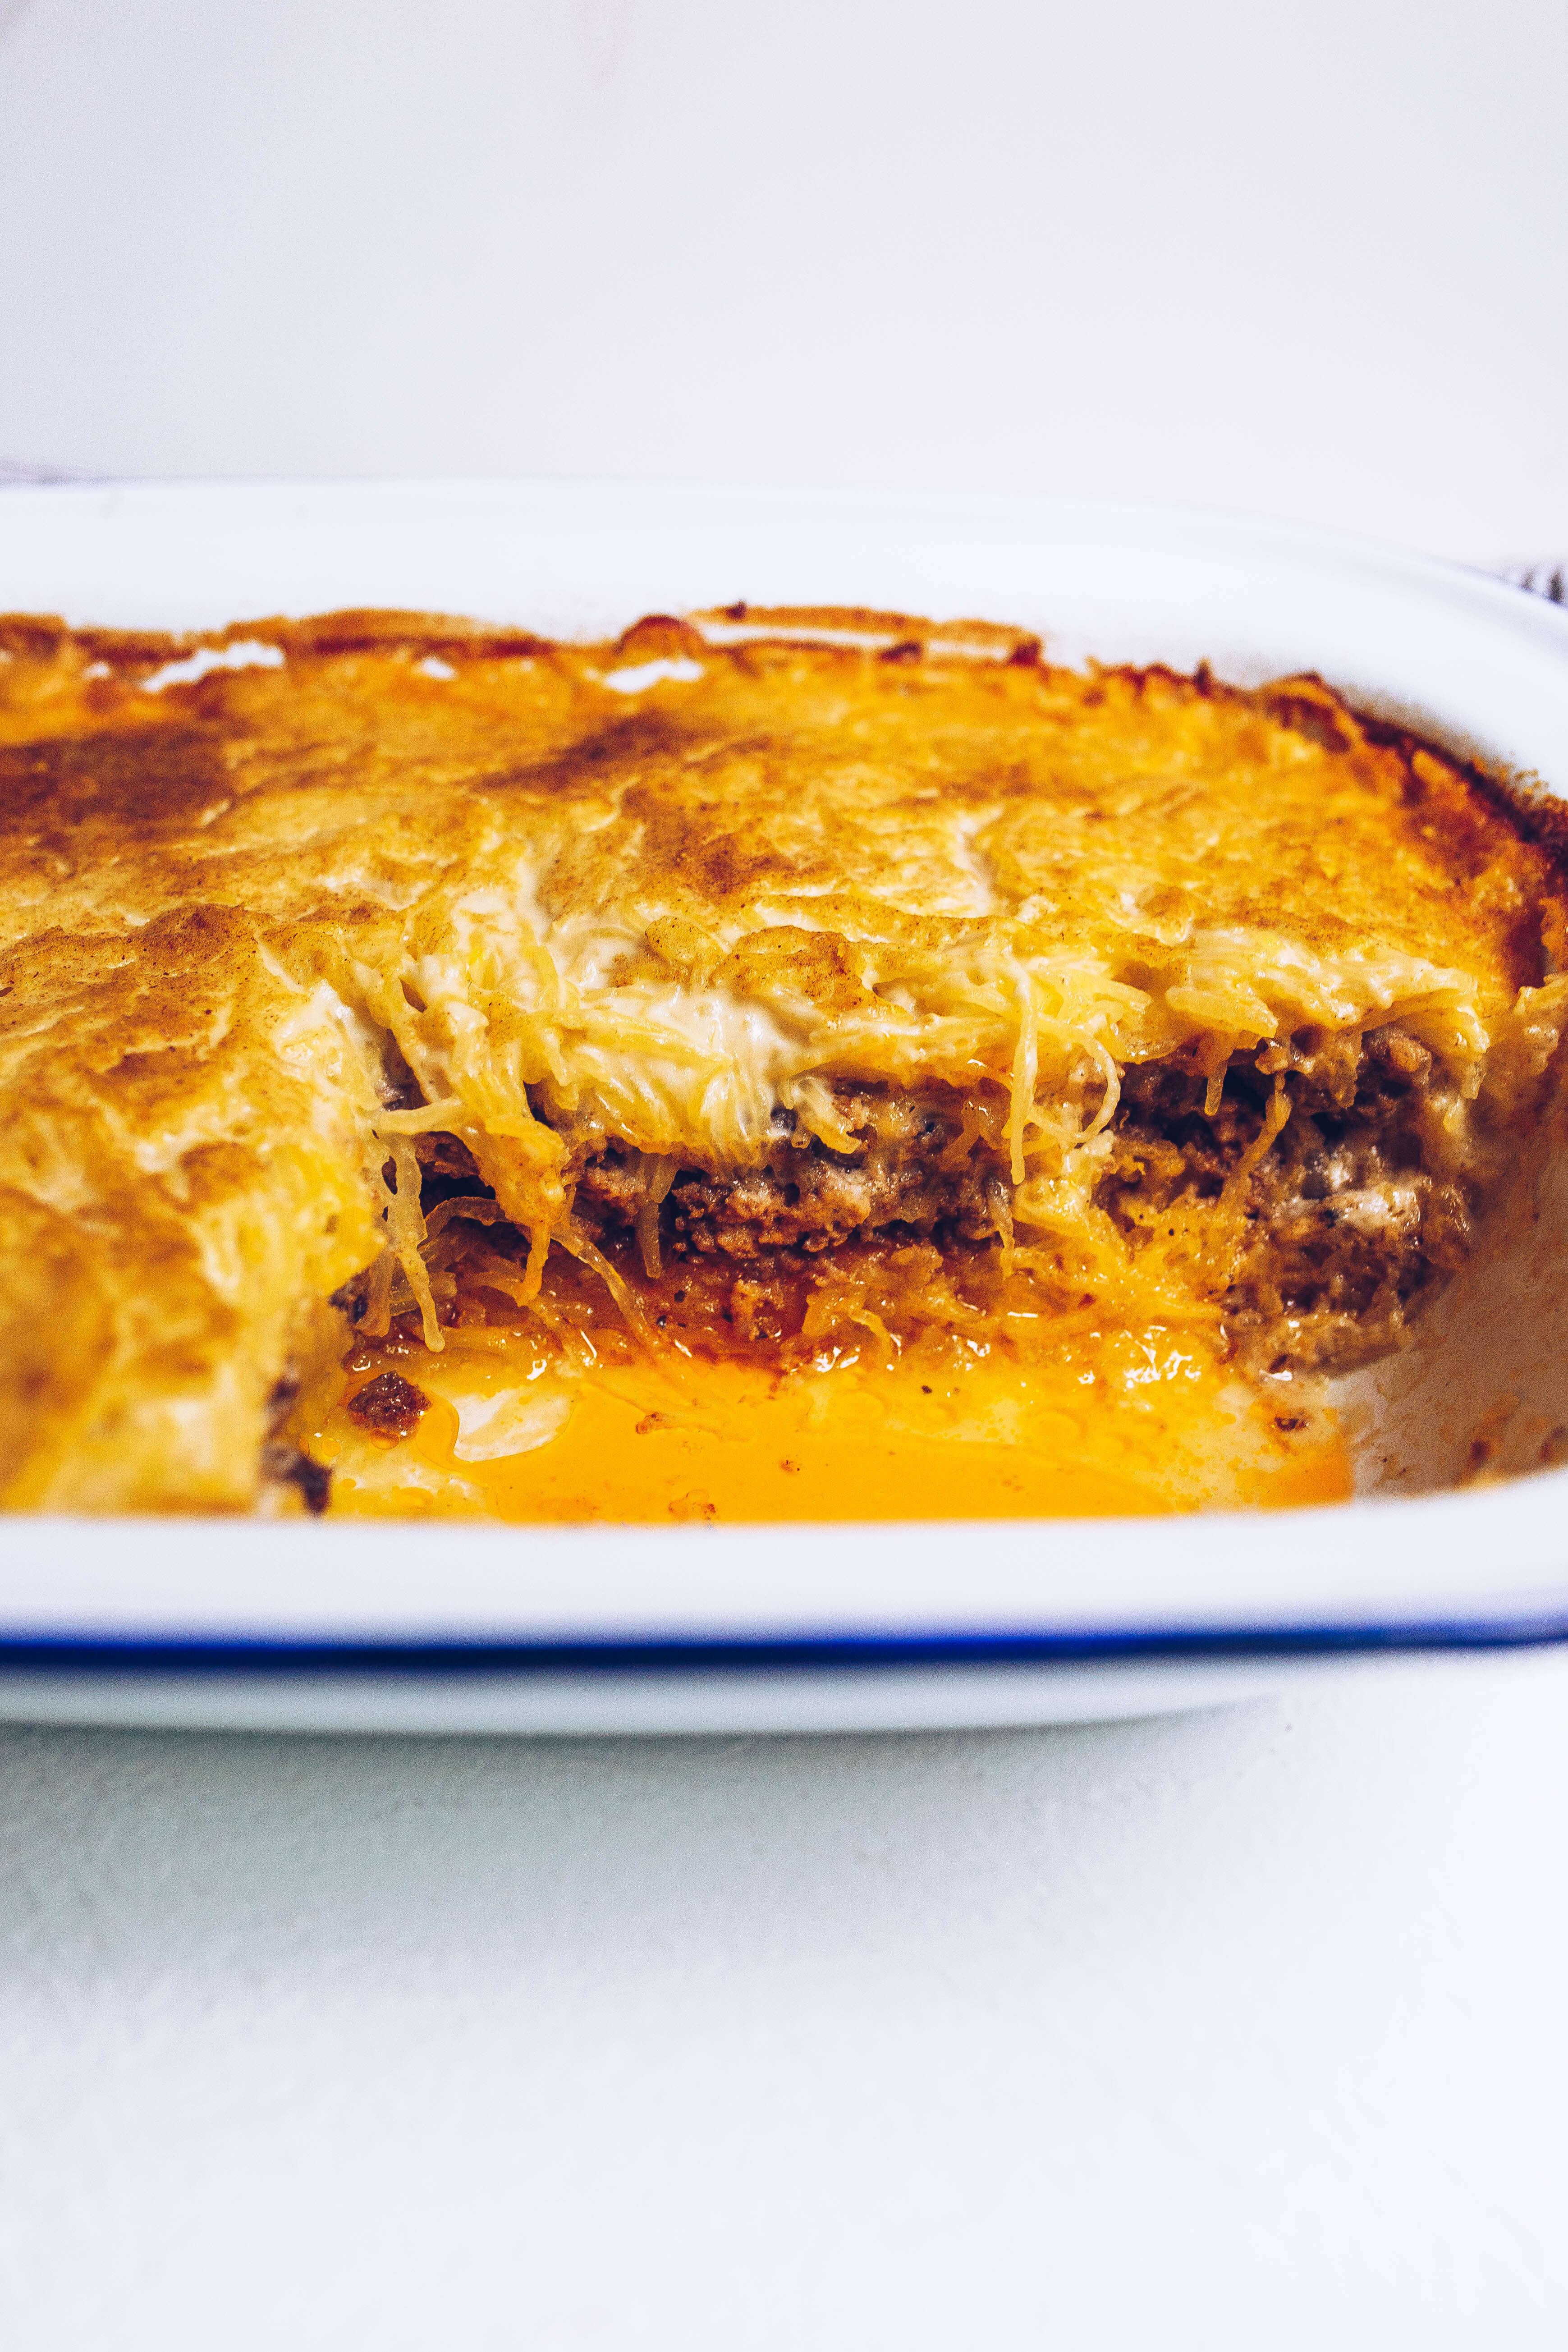 Paleo Spaghetti Squash Pastitsio (Greek Baked Ziti w/ Dairy-free Bechamel) dairy-free, gluten-free, grain-free, low-carb, AIP-friendly via Food by Mars